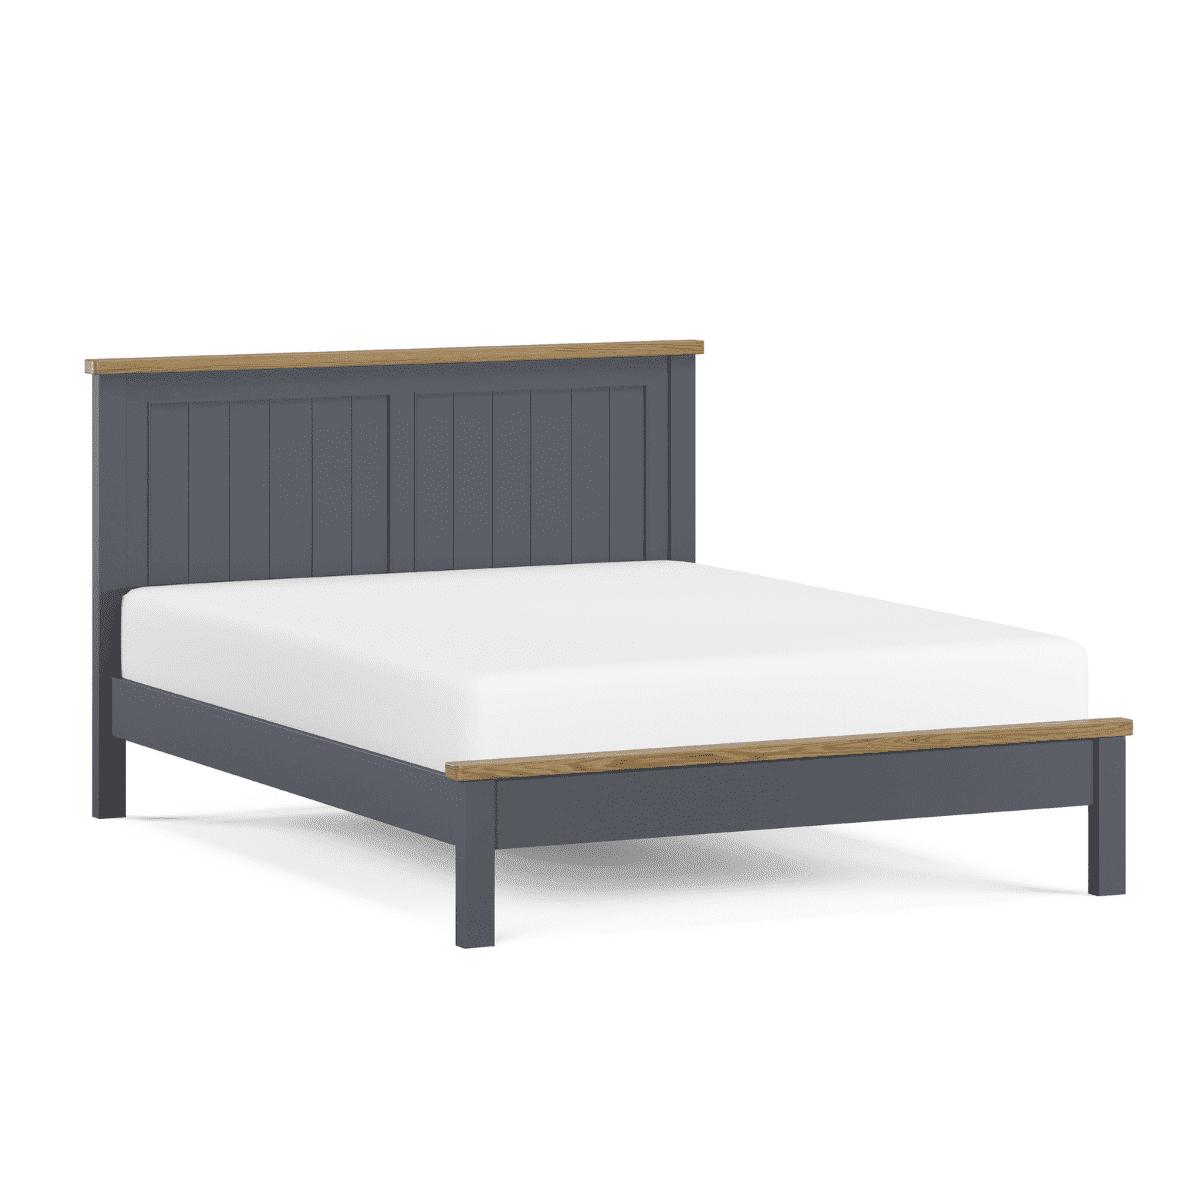 Chesham Blue Wooden Bed Frame - 1